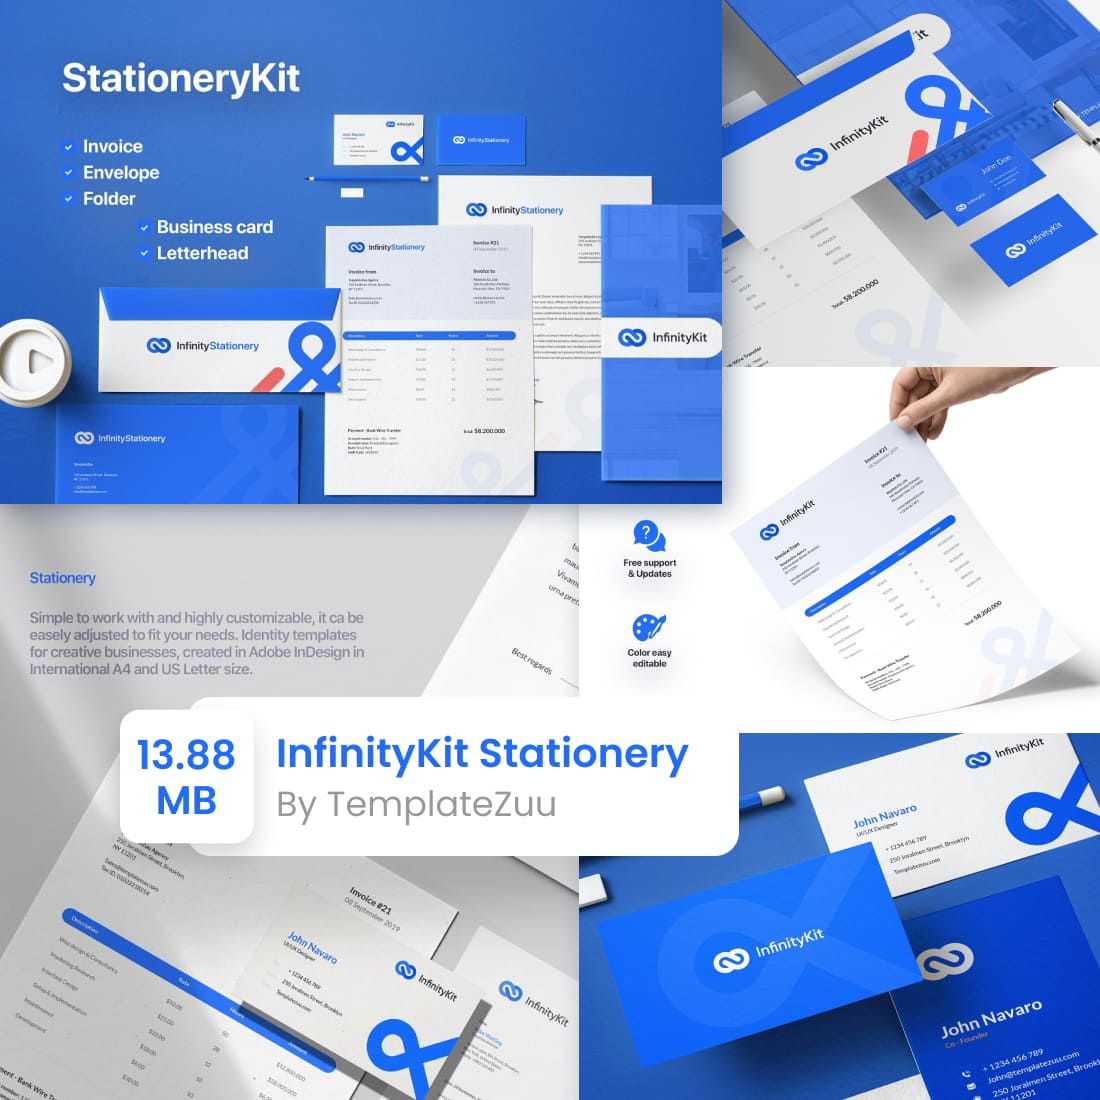 InfinityKit Stationery by MasterBundles.